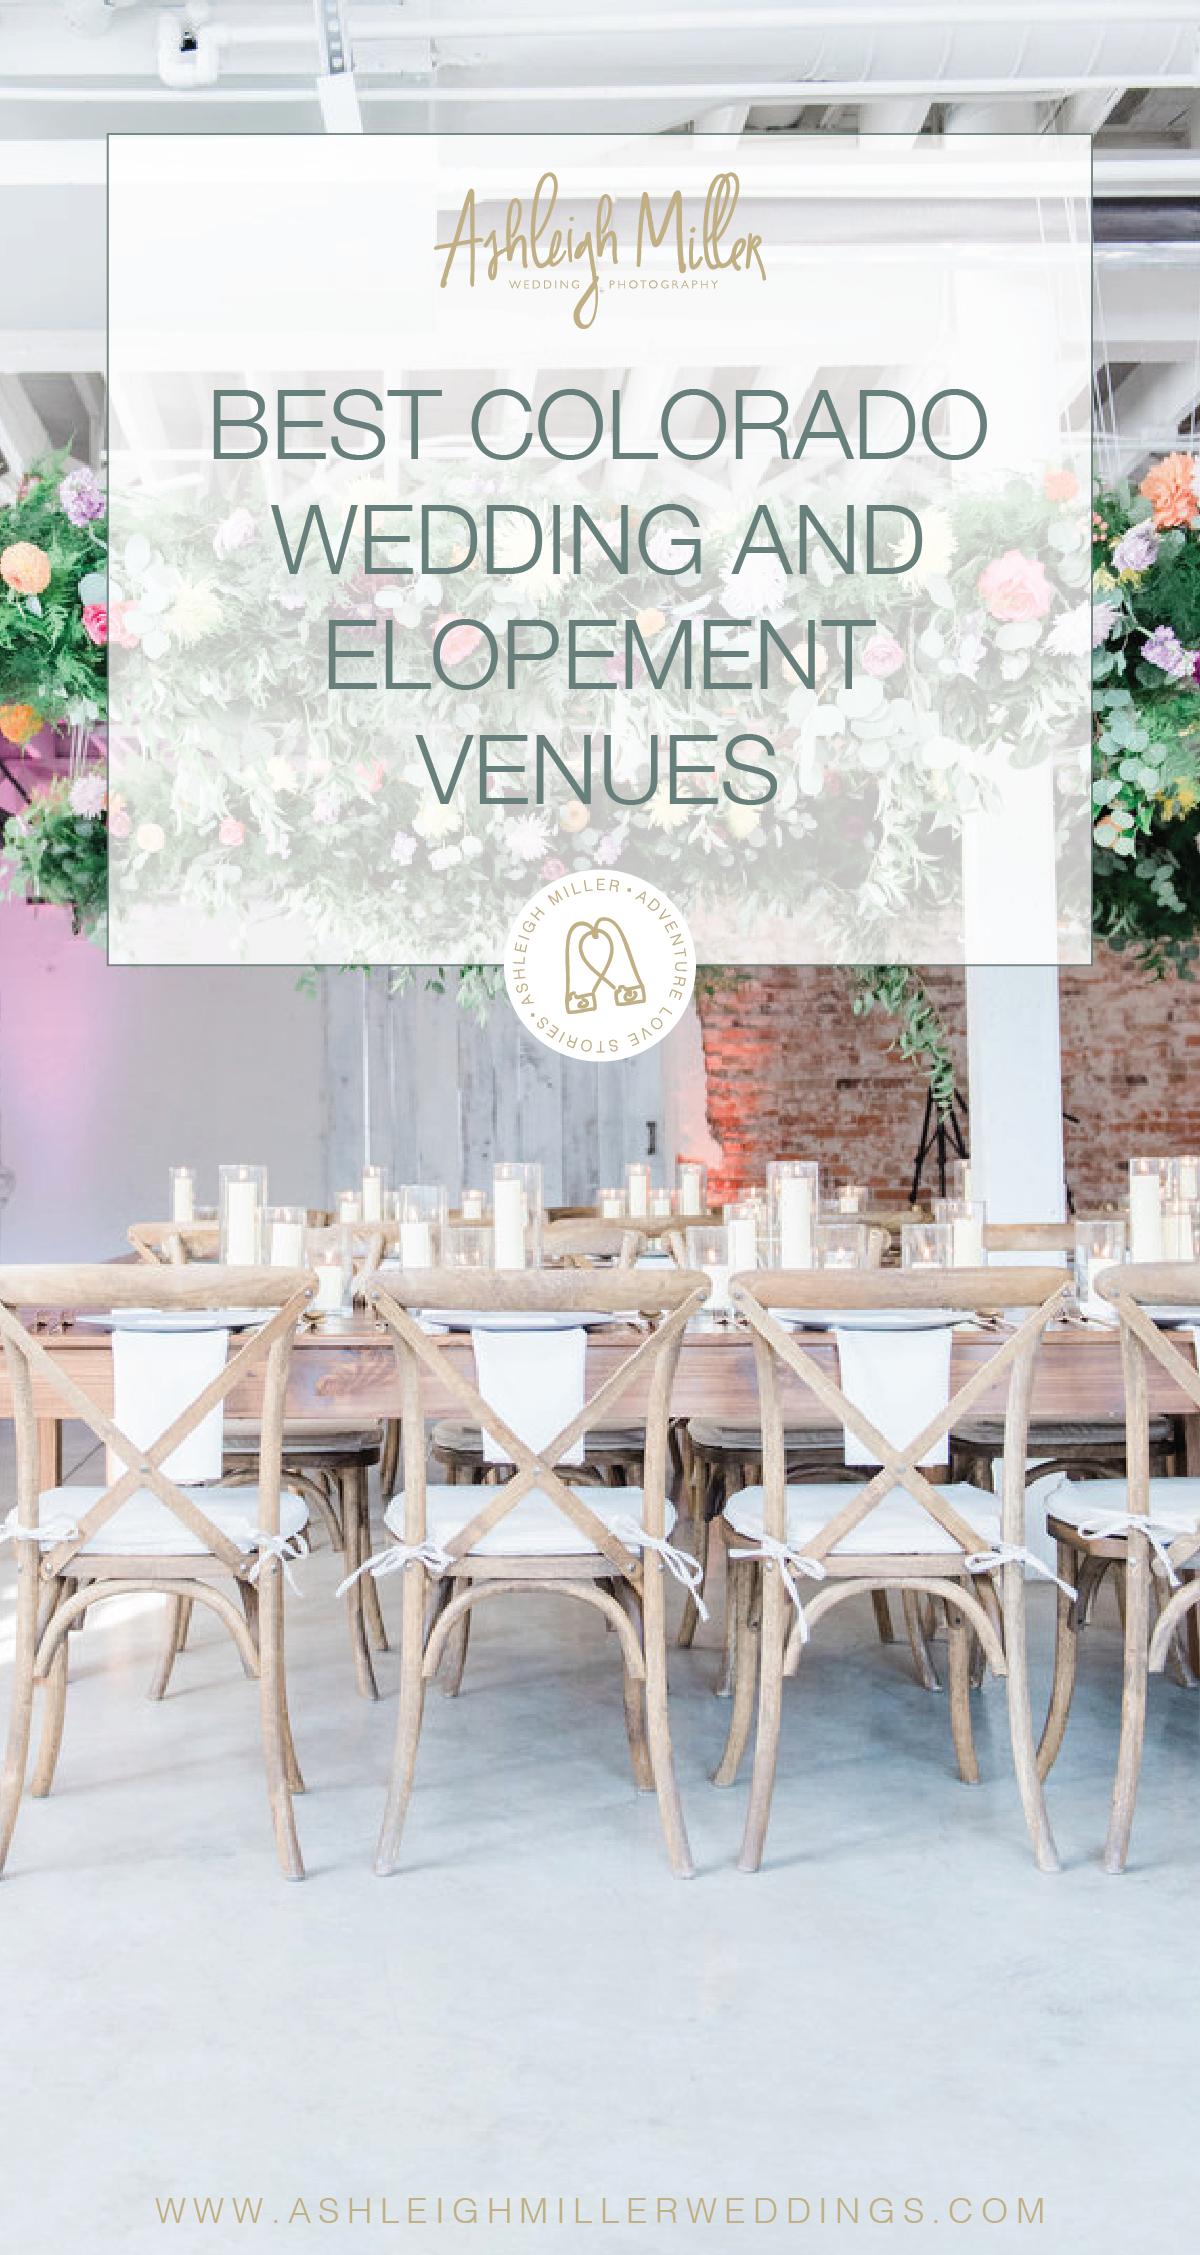 Best-Colorado-Wedding-and-Elopement-Venues-03.png